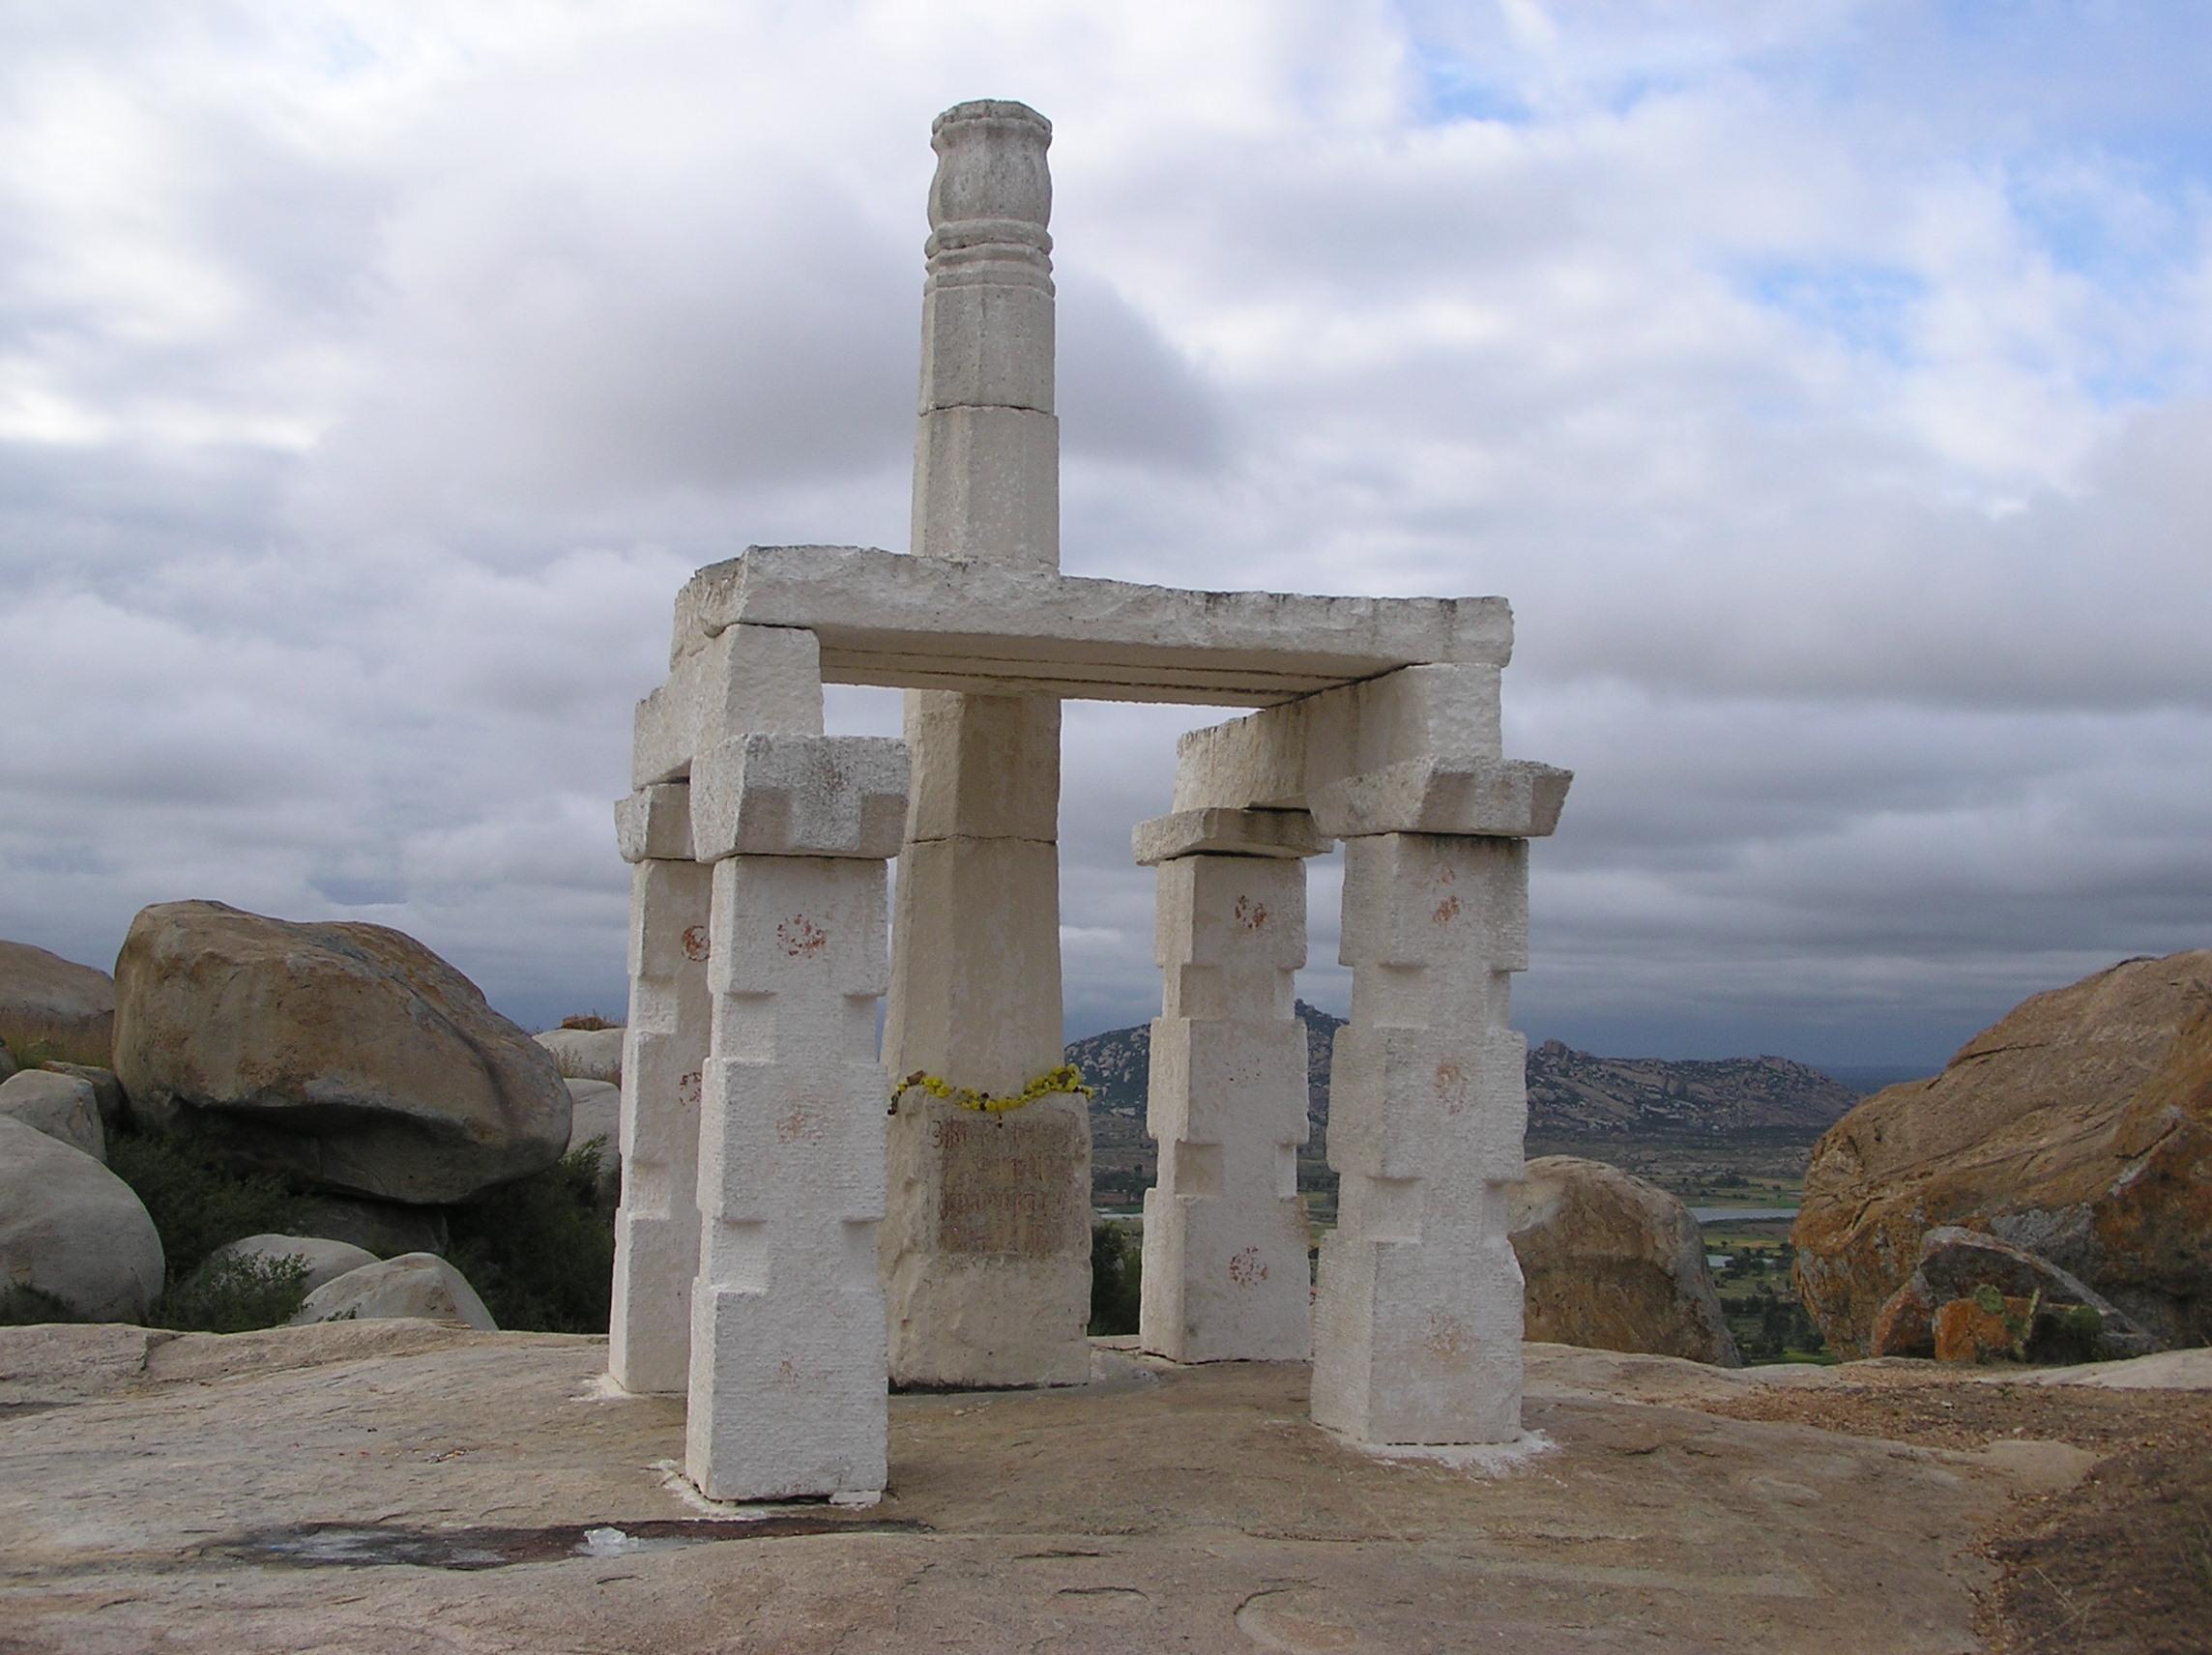 AKSHOBHYA THEERTHARA VijyaSthambha